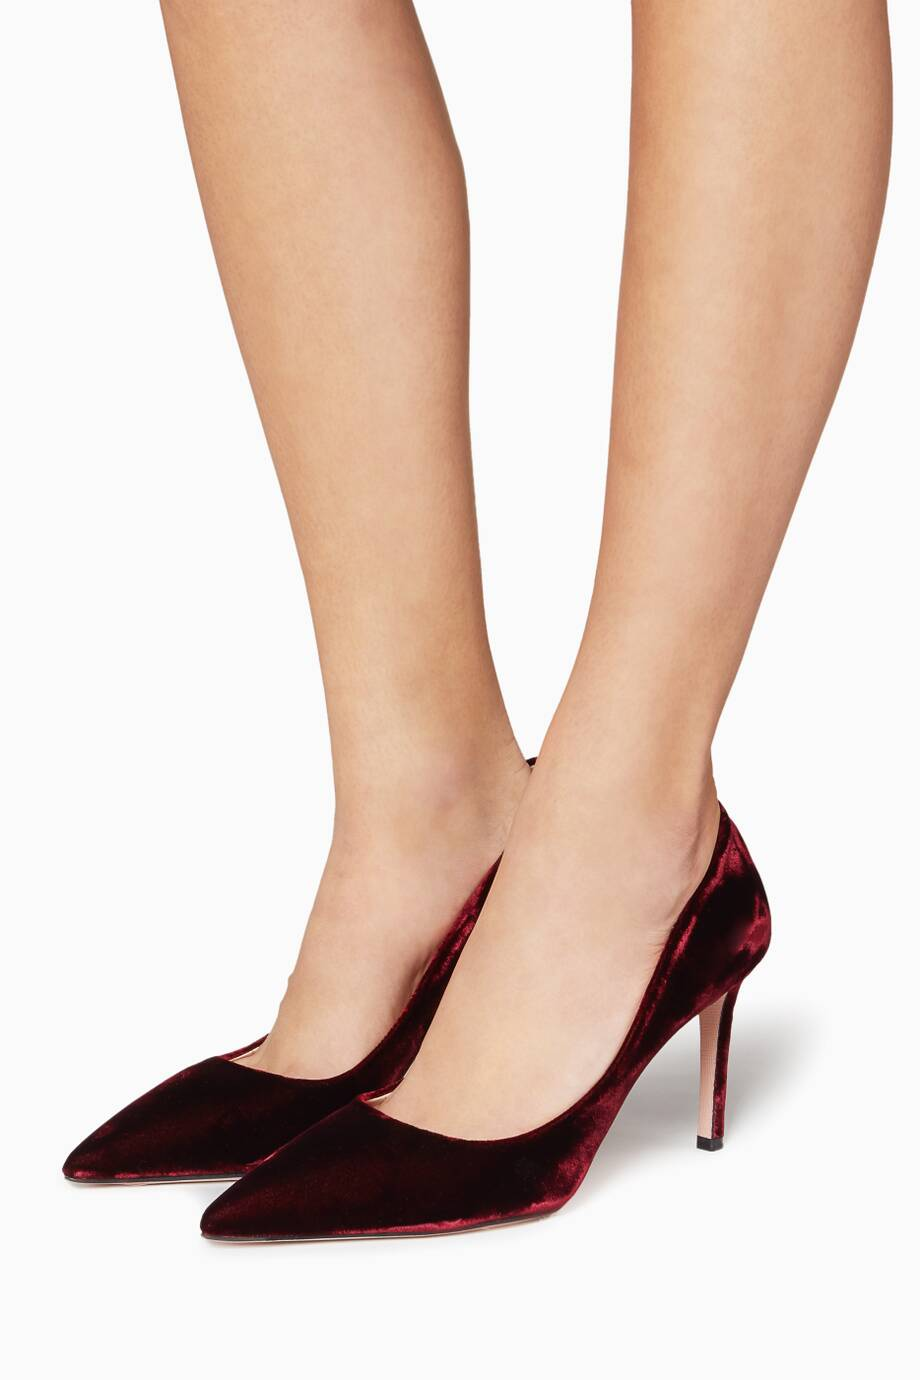 6f40c32fe44b0 تسوق حذاء كعب عالي مخمل بنفسجي من برادا